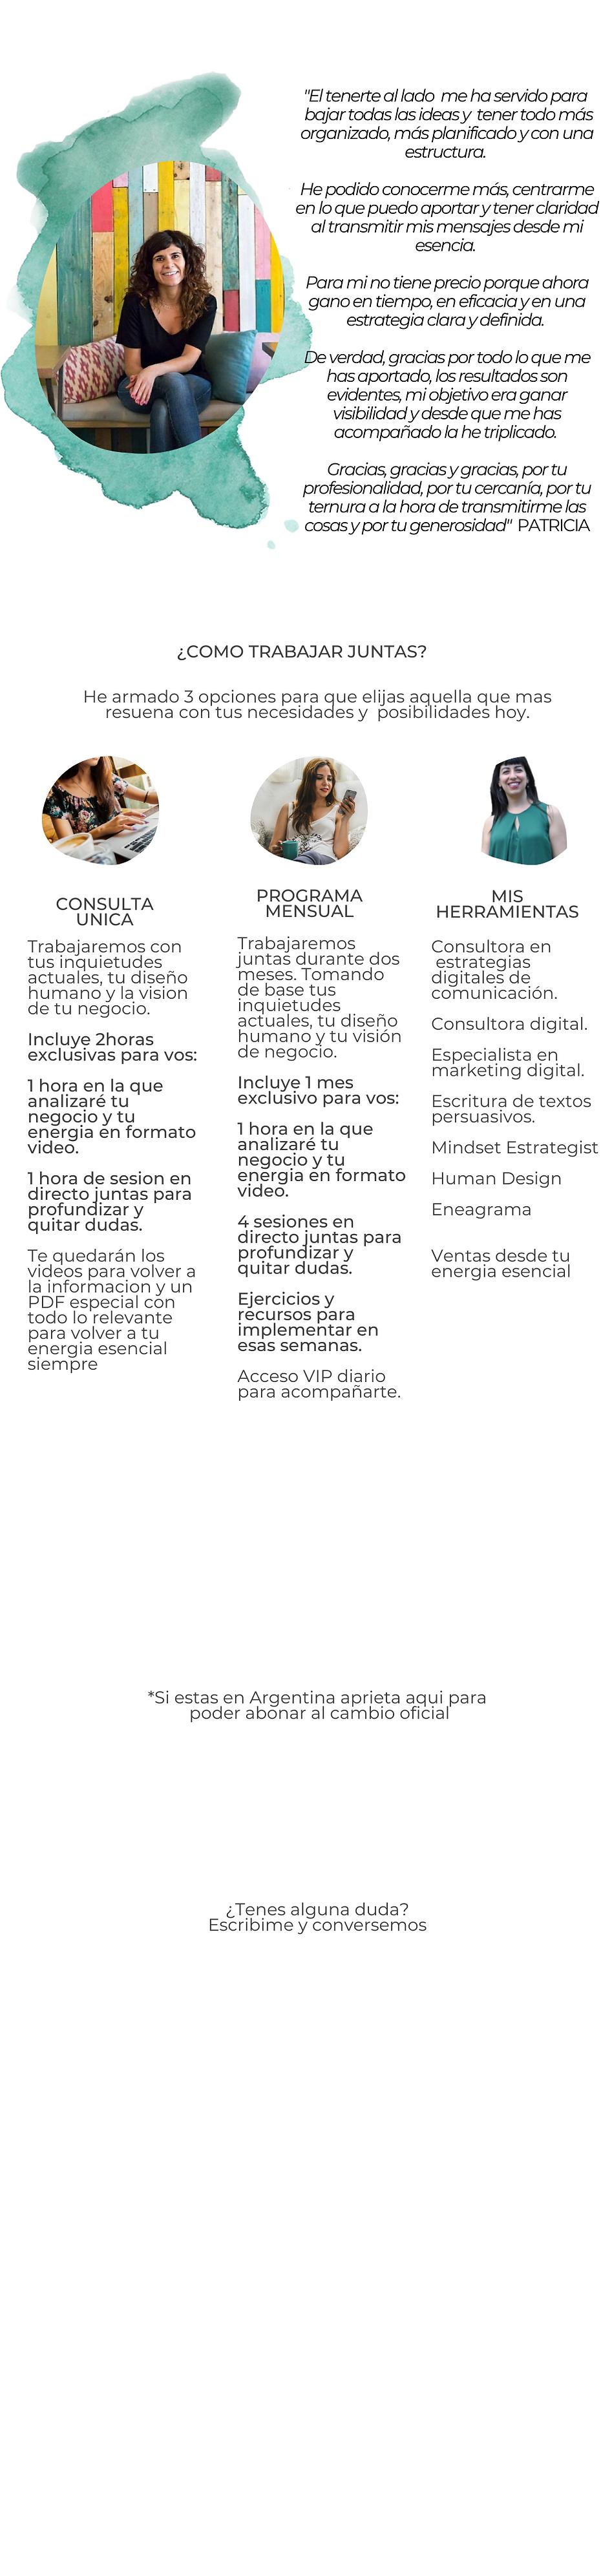 transformacion profesional (4).png